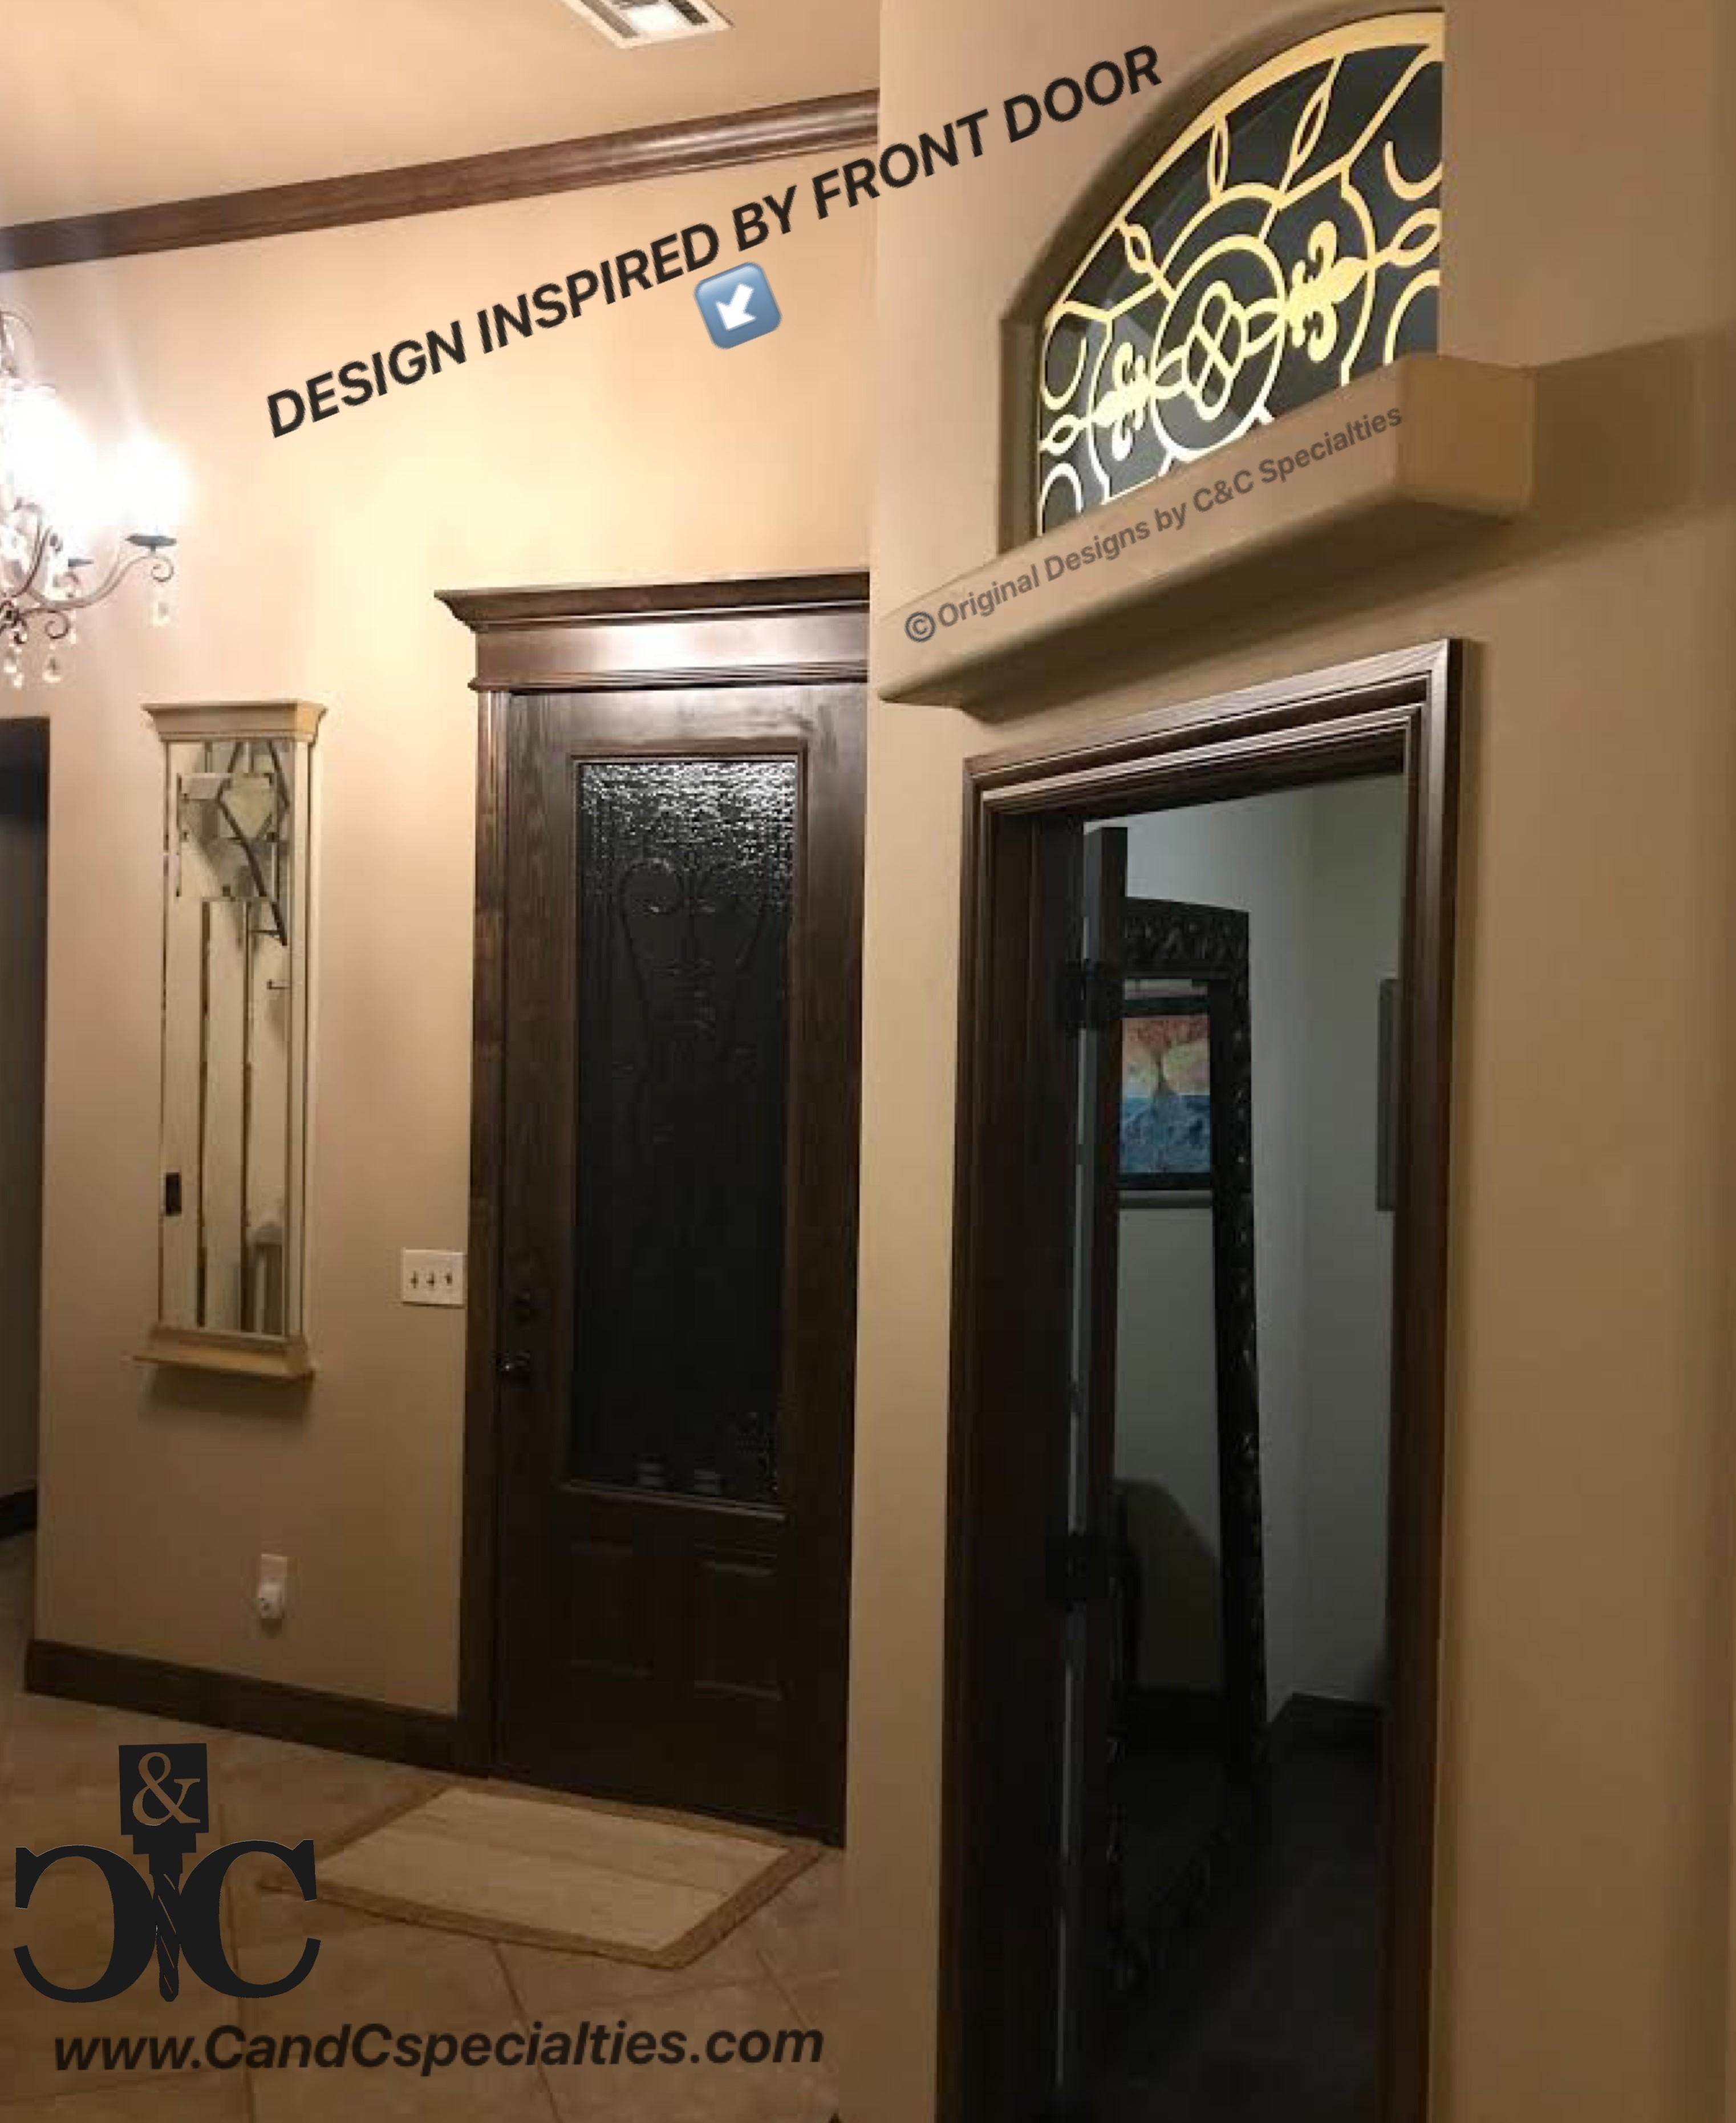 COMPLETLEY UNIQUE AND CUSTOM DESIGN FOR MULLION BASED OFF FRONT DOOR DESIGN